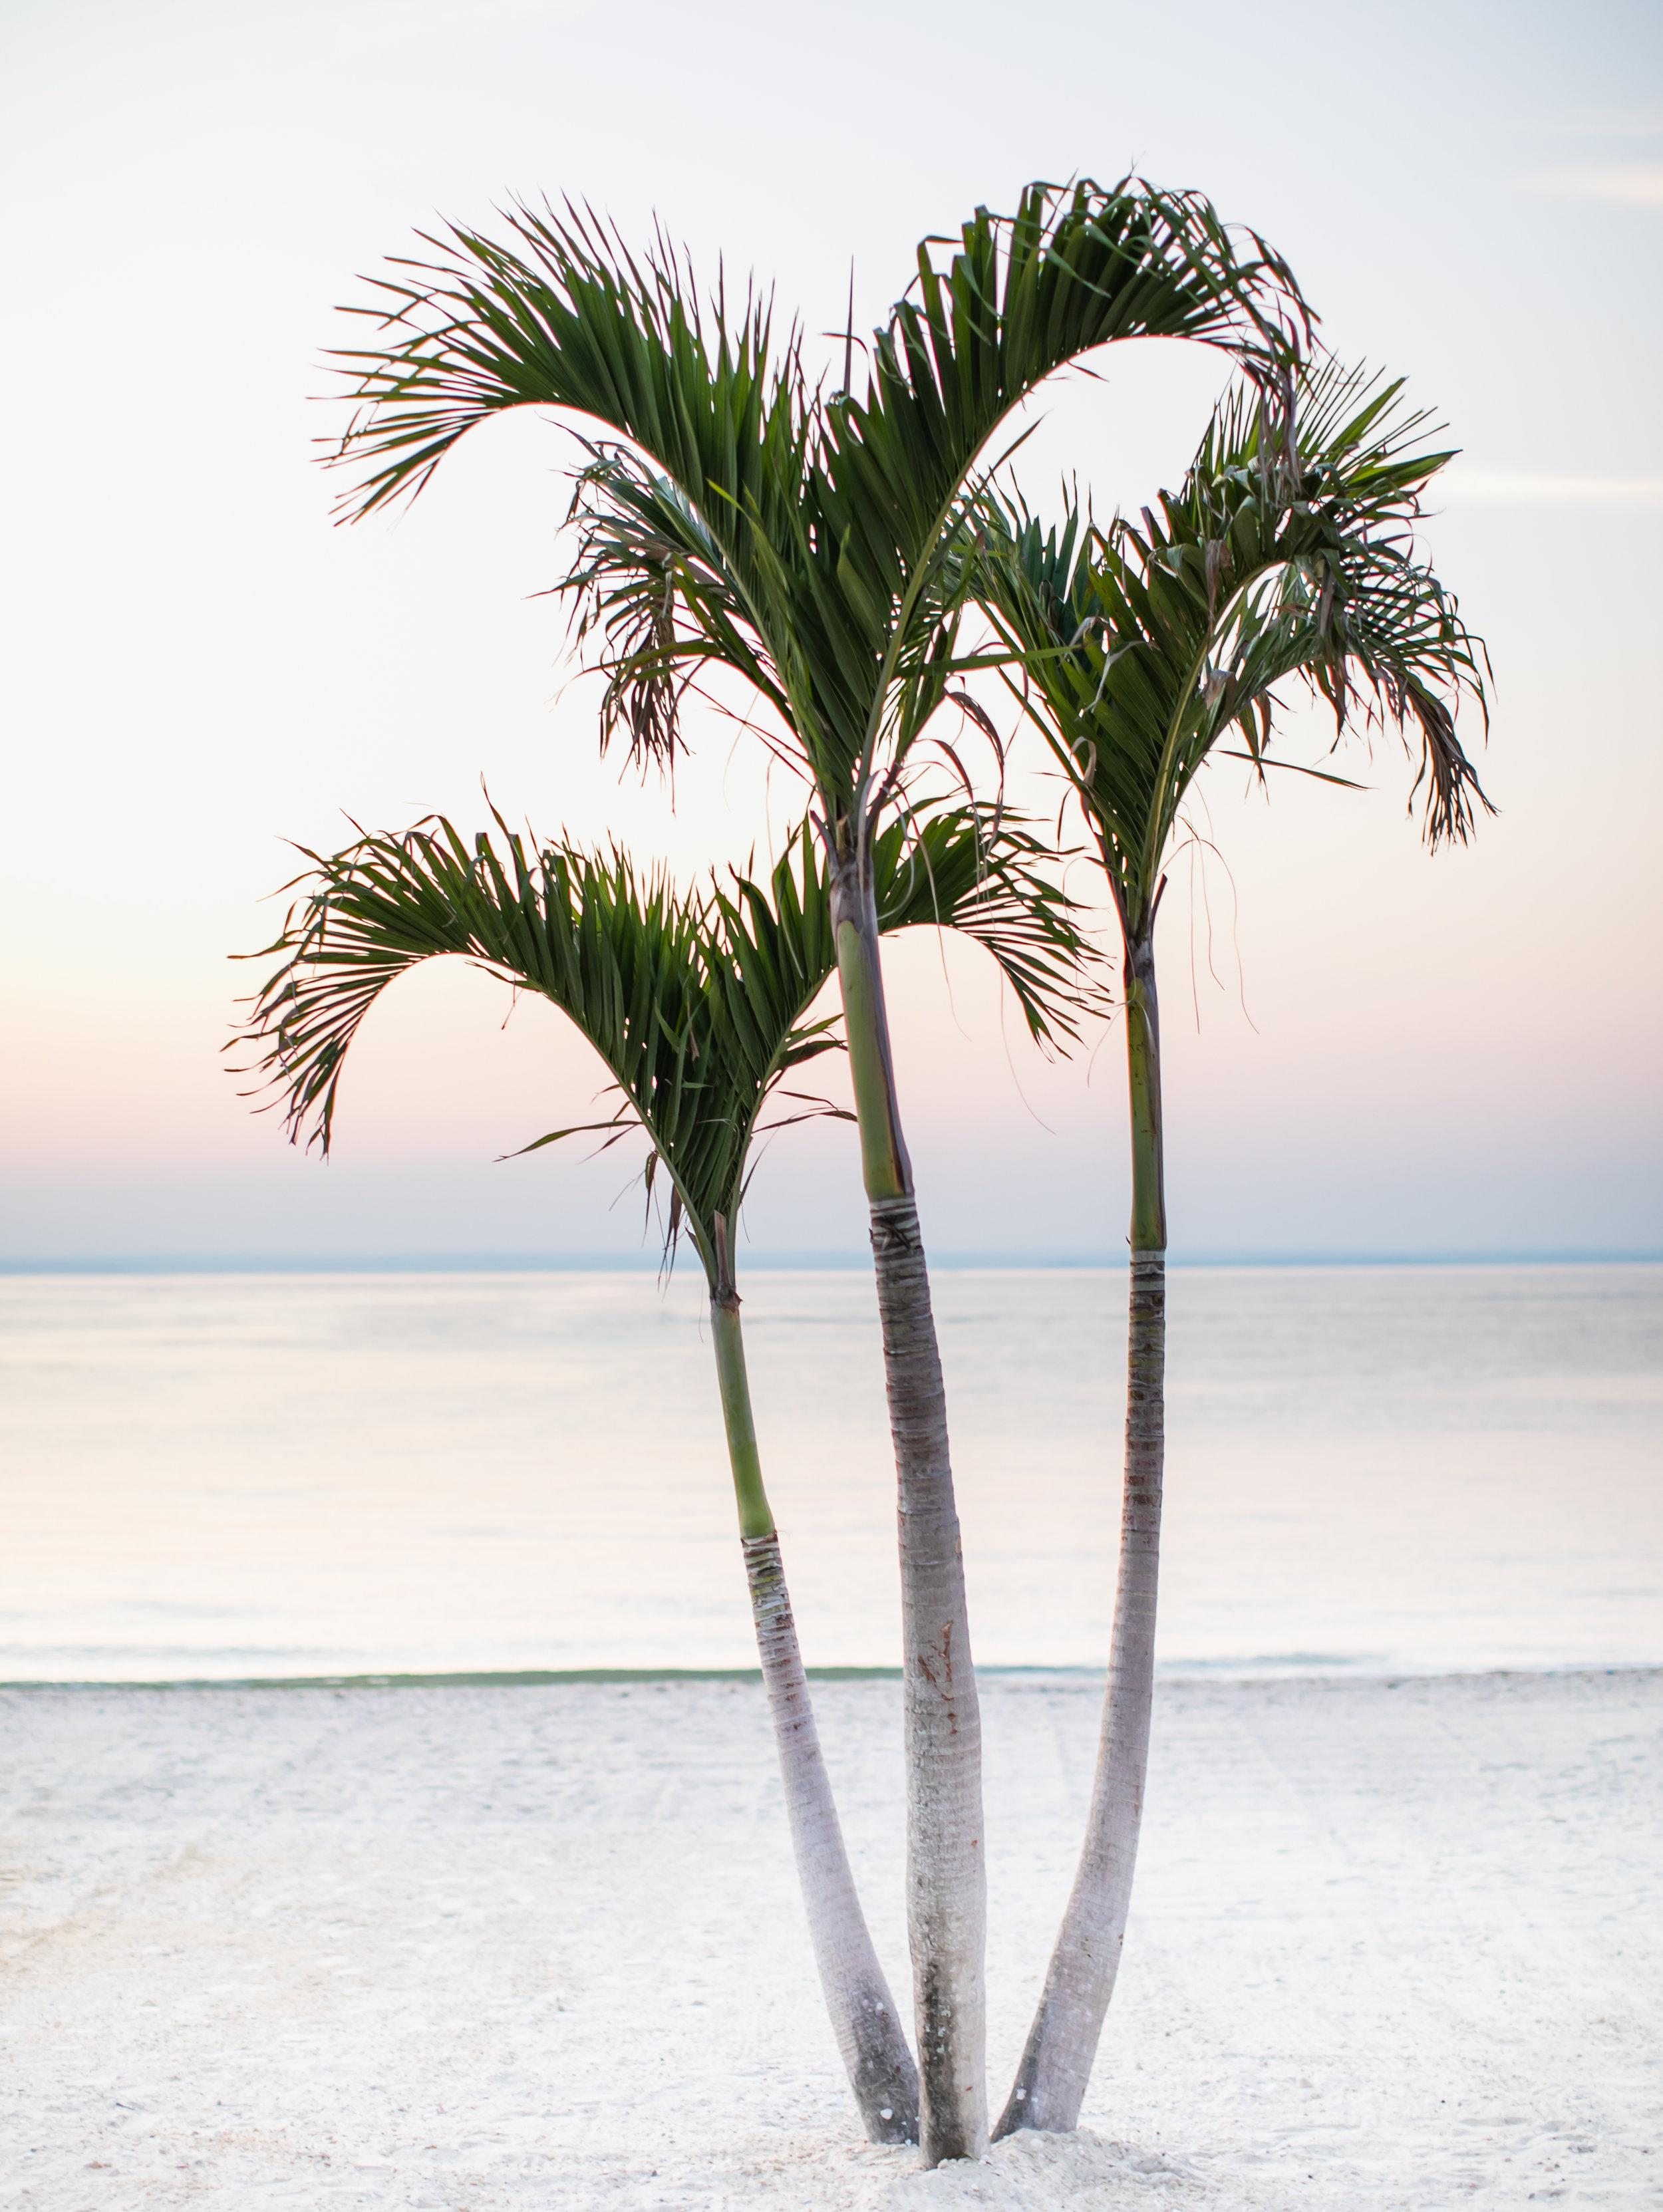 asher-gardner-cresent-beach-club-00866.jpg